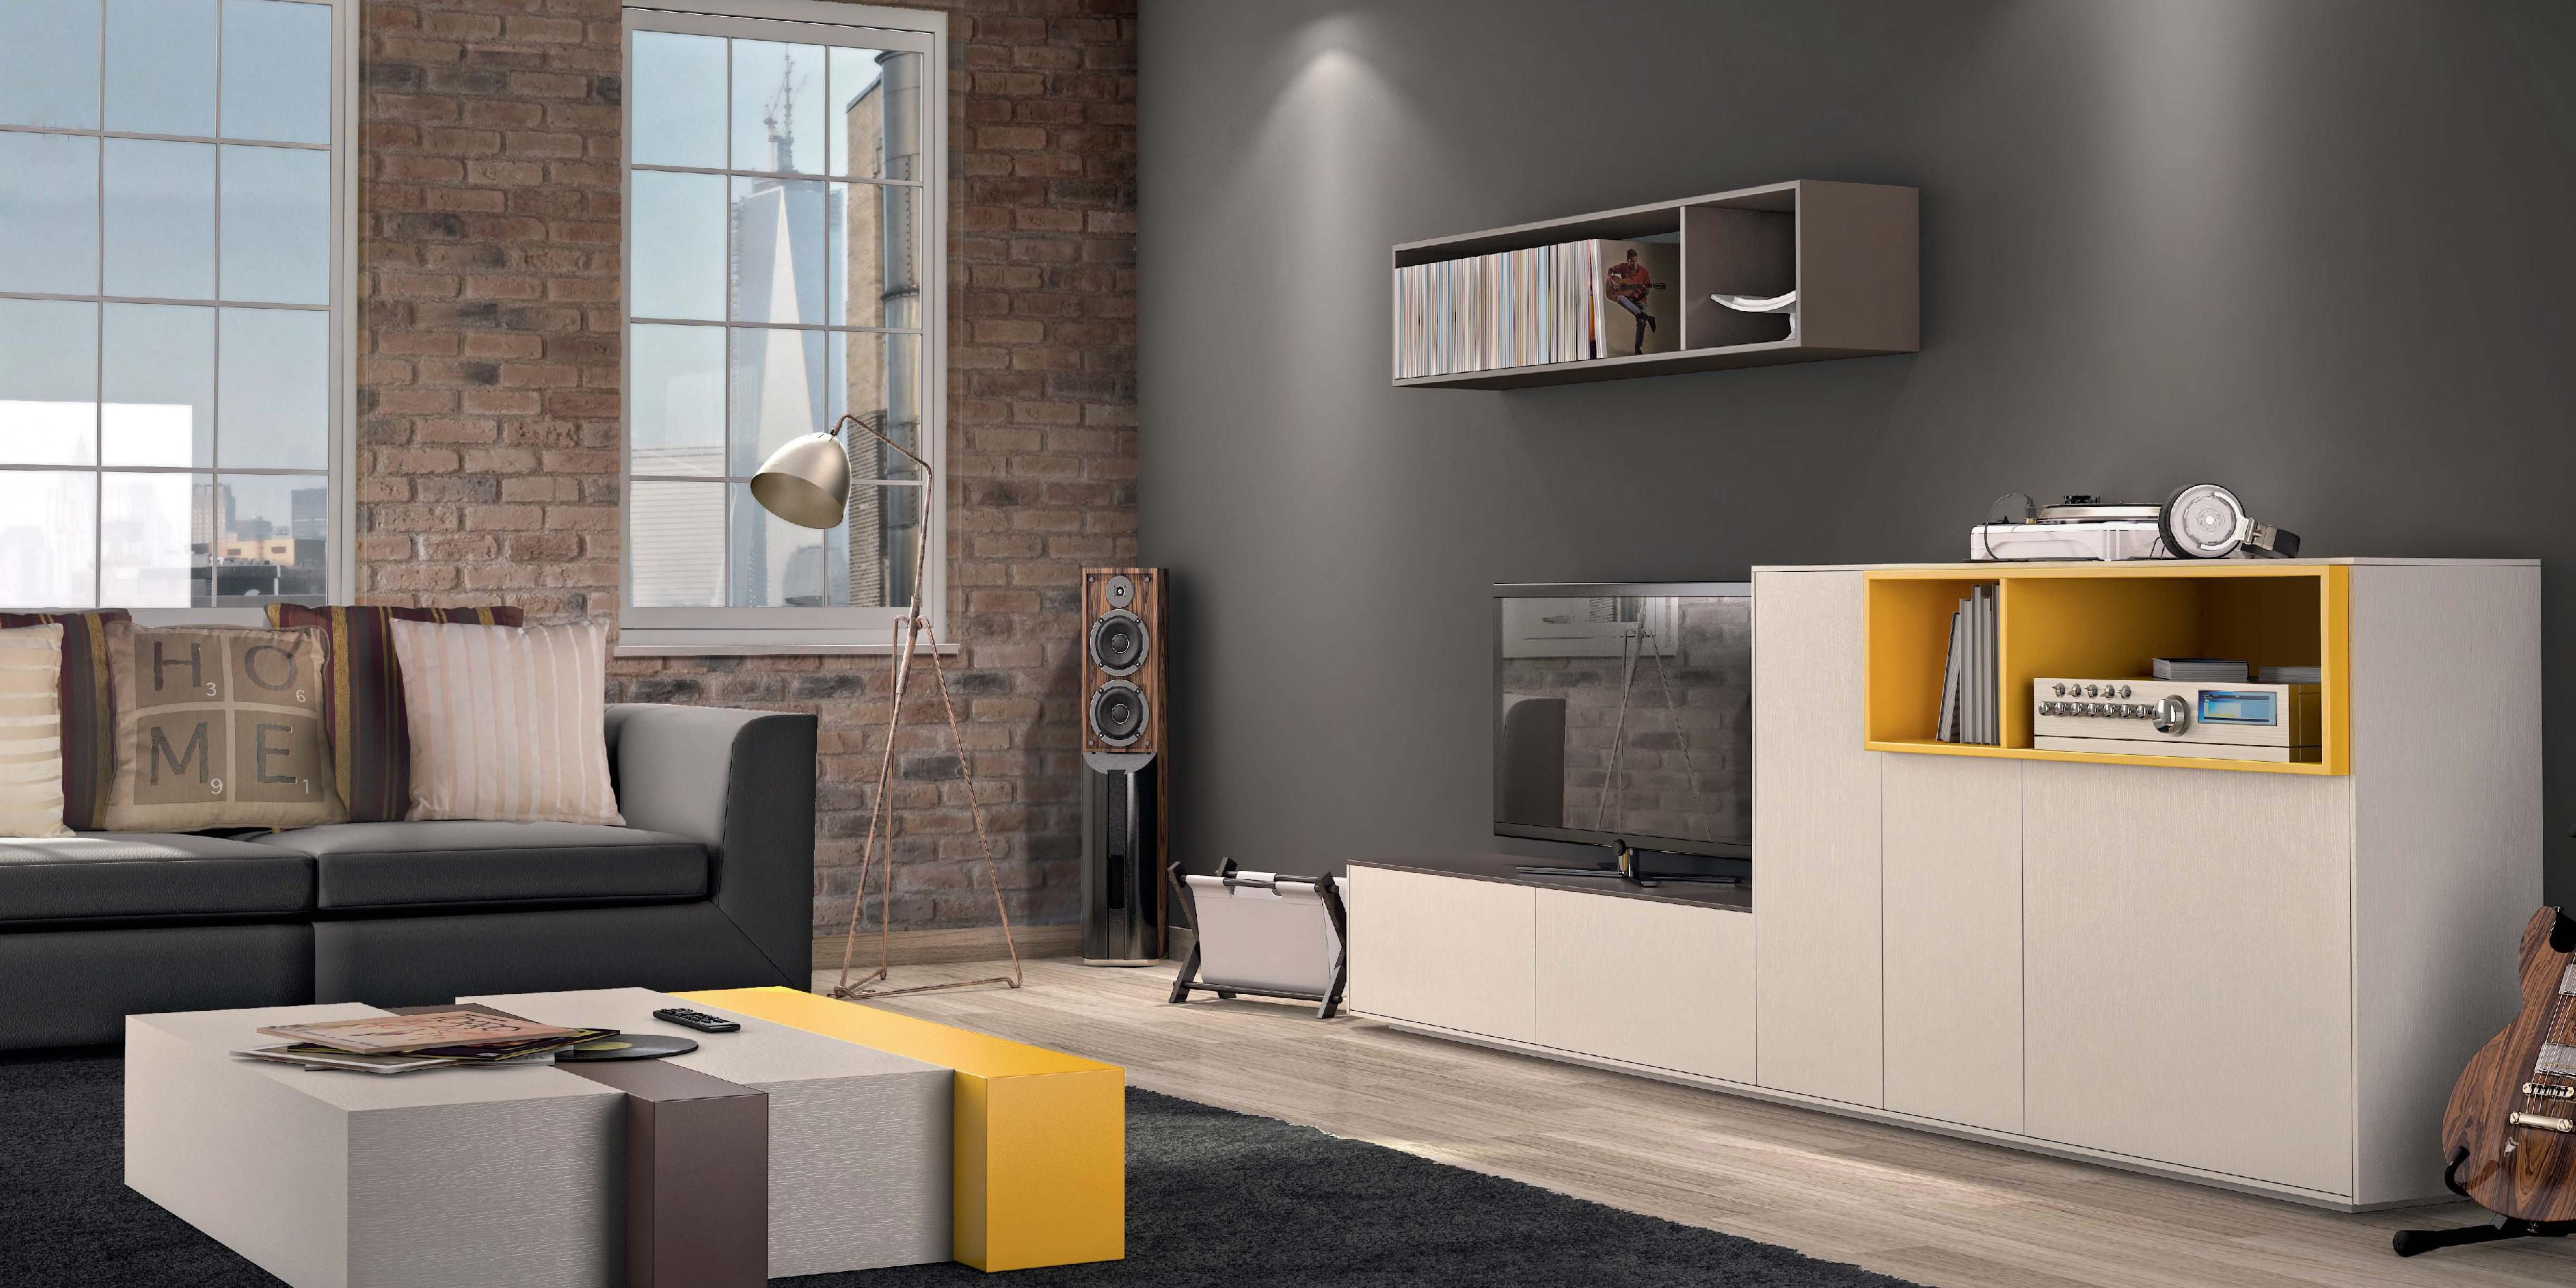 Salas de estar Living rooms www.intense-mobiliario.com  Cookie http://intense-mobiliario.com/product.php?id_product=3657